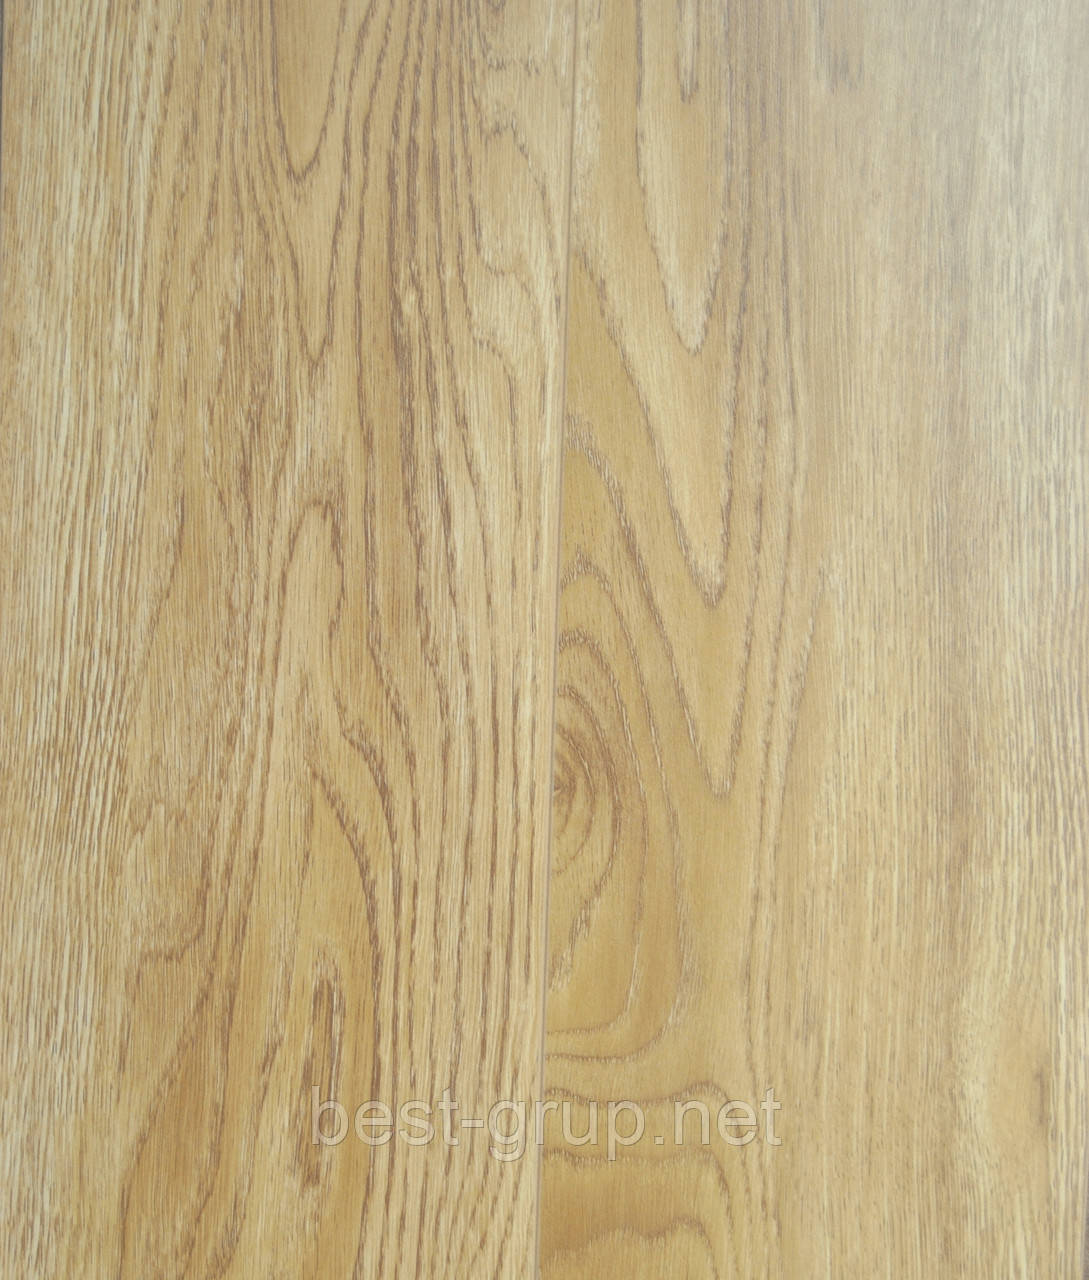 93403 - Дуб Мугано. Влагостойкий ламинат Grun Holz (Грун Холц) Naturlichen spiegel